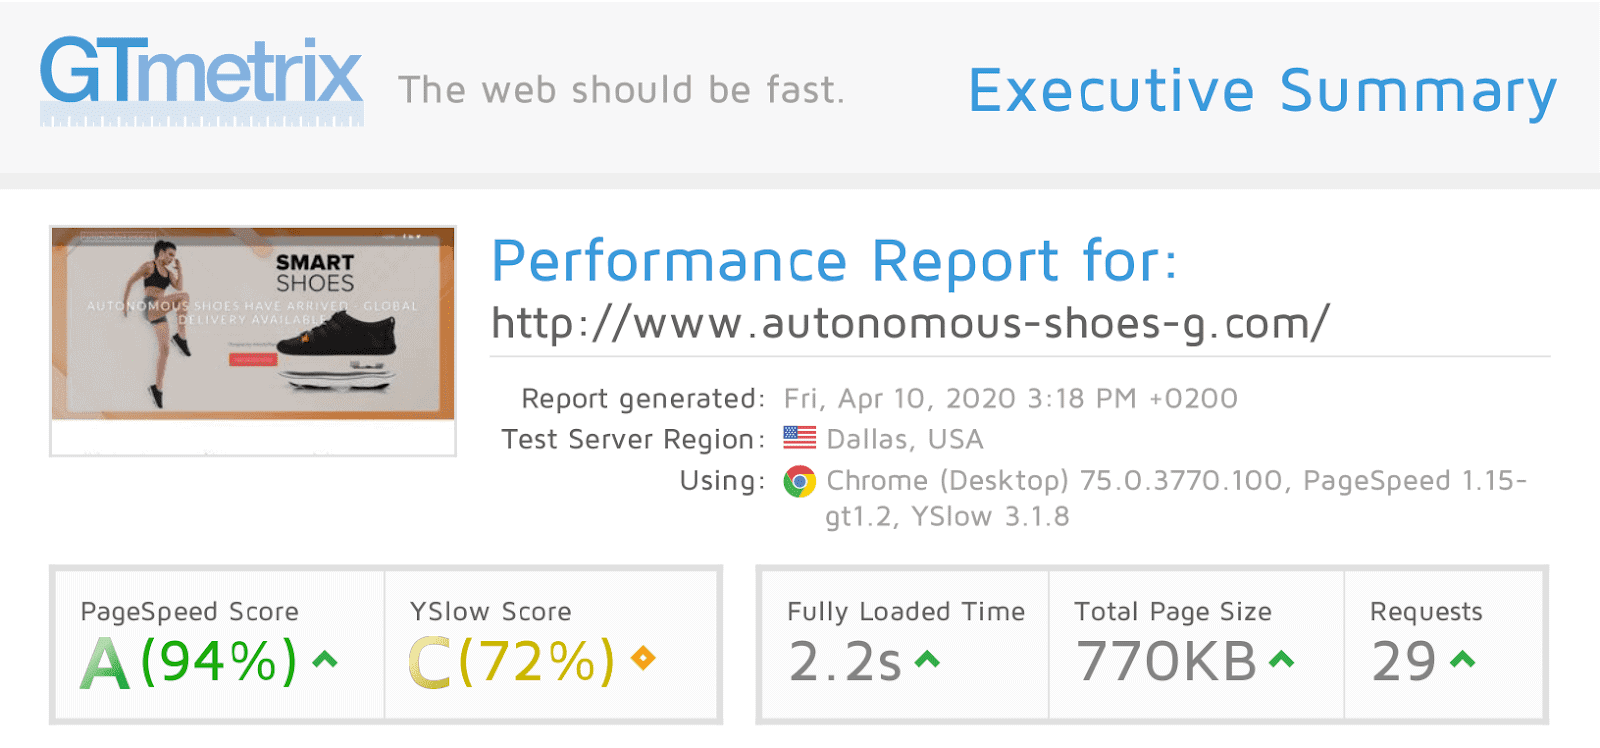 GoDaddy - GTmetrix results